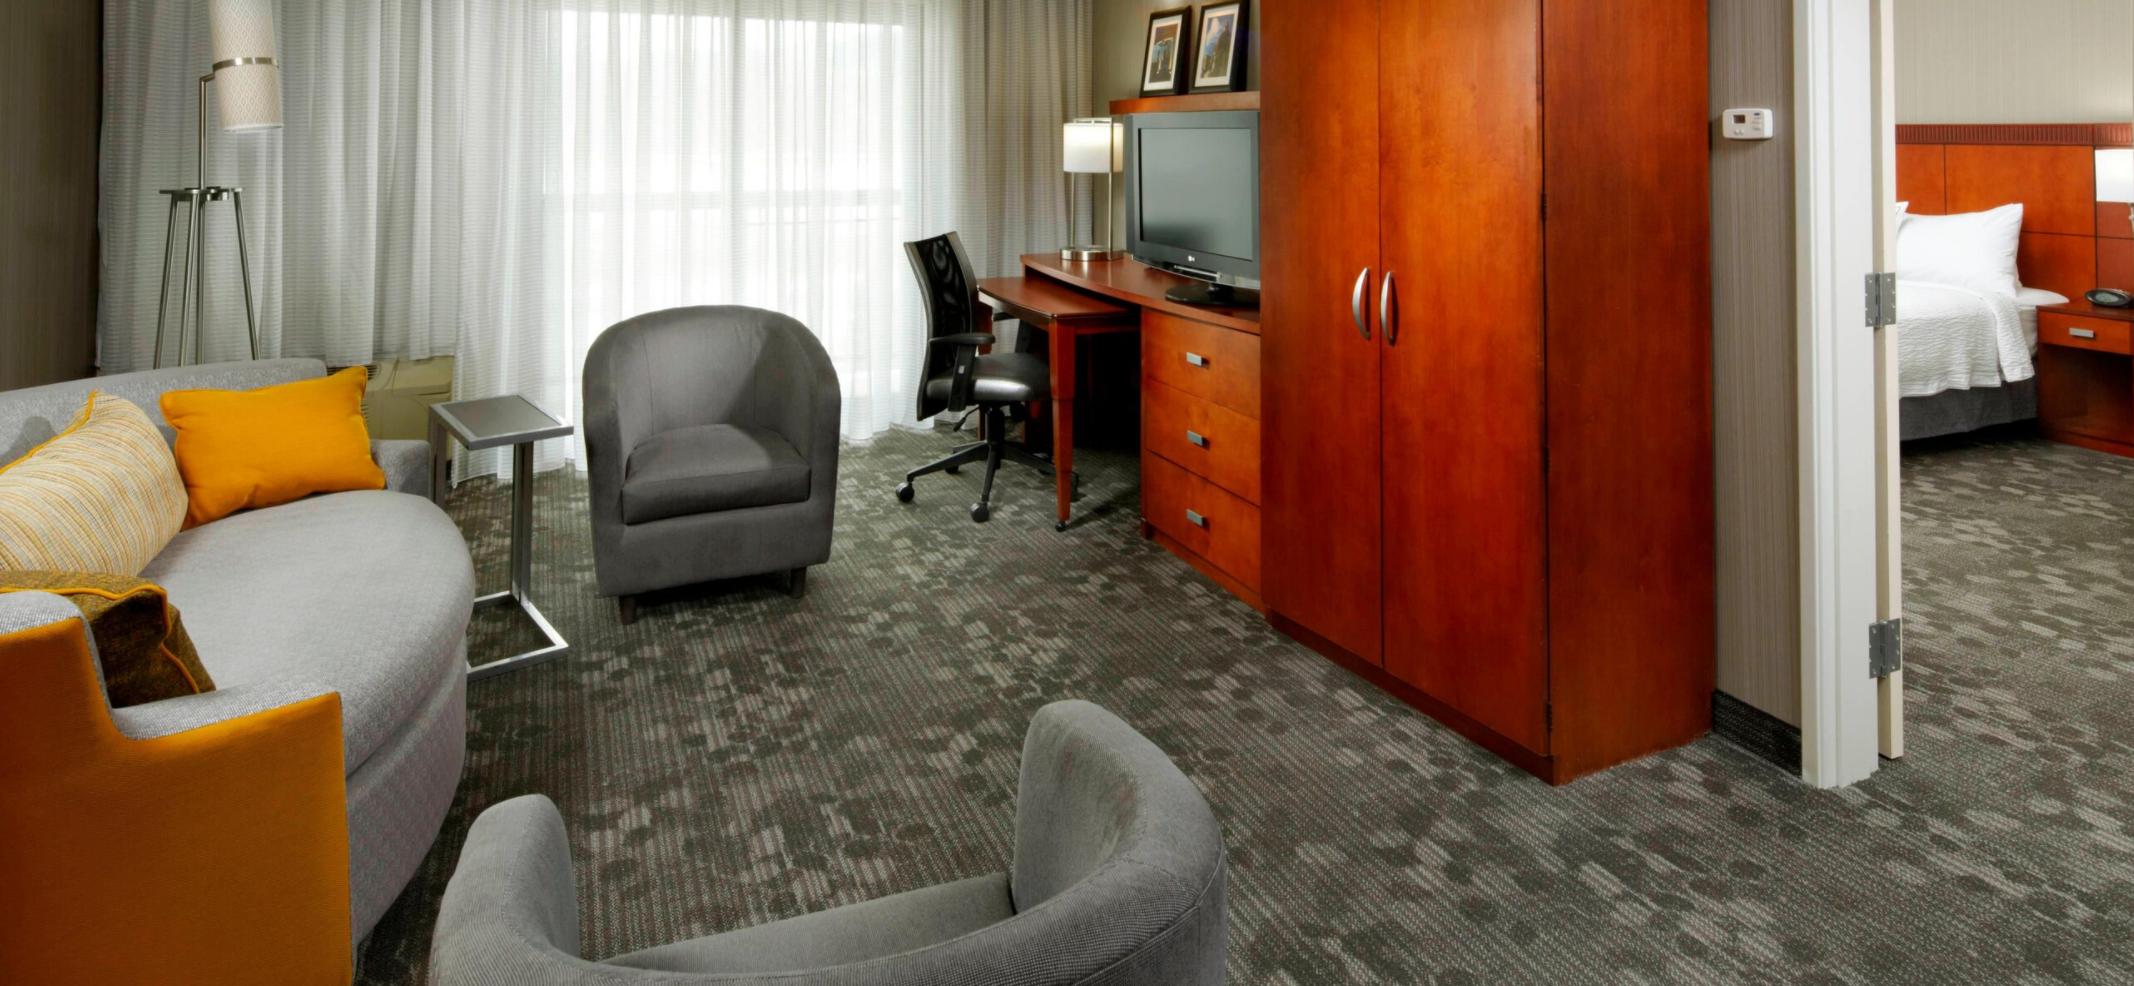 https://www.hotelsbyday.com/_data/default-hotel_image/3/18454/screenshot-2020-06-12-at-4-15-39-pm.png